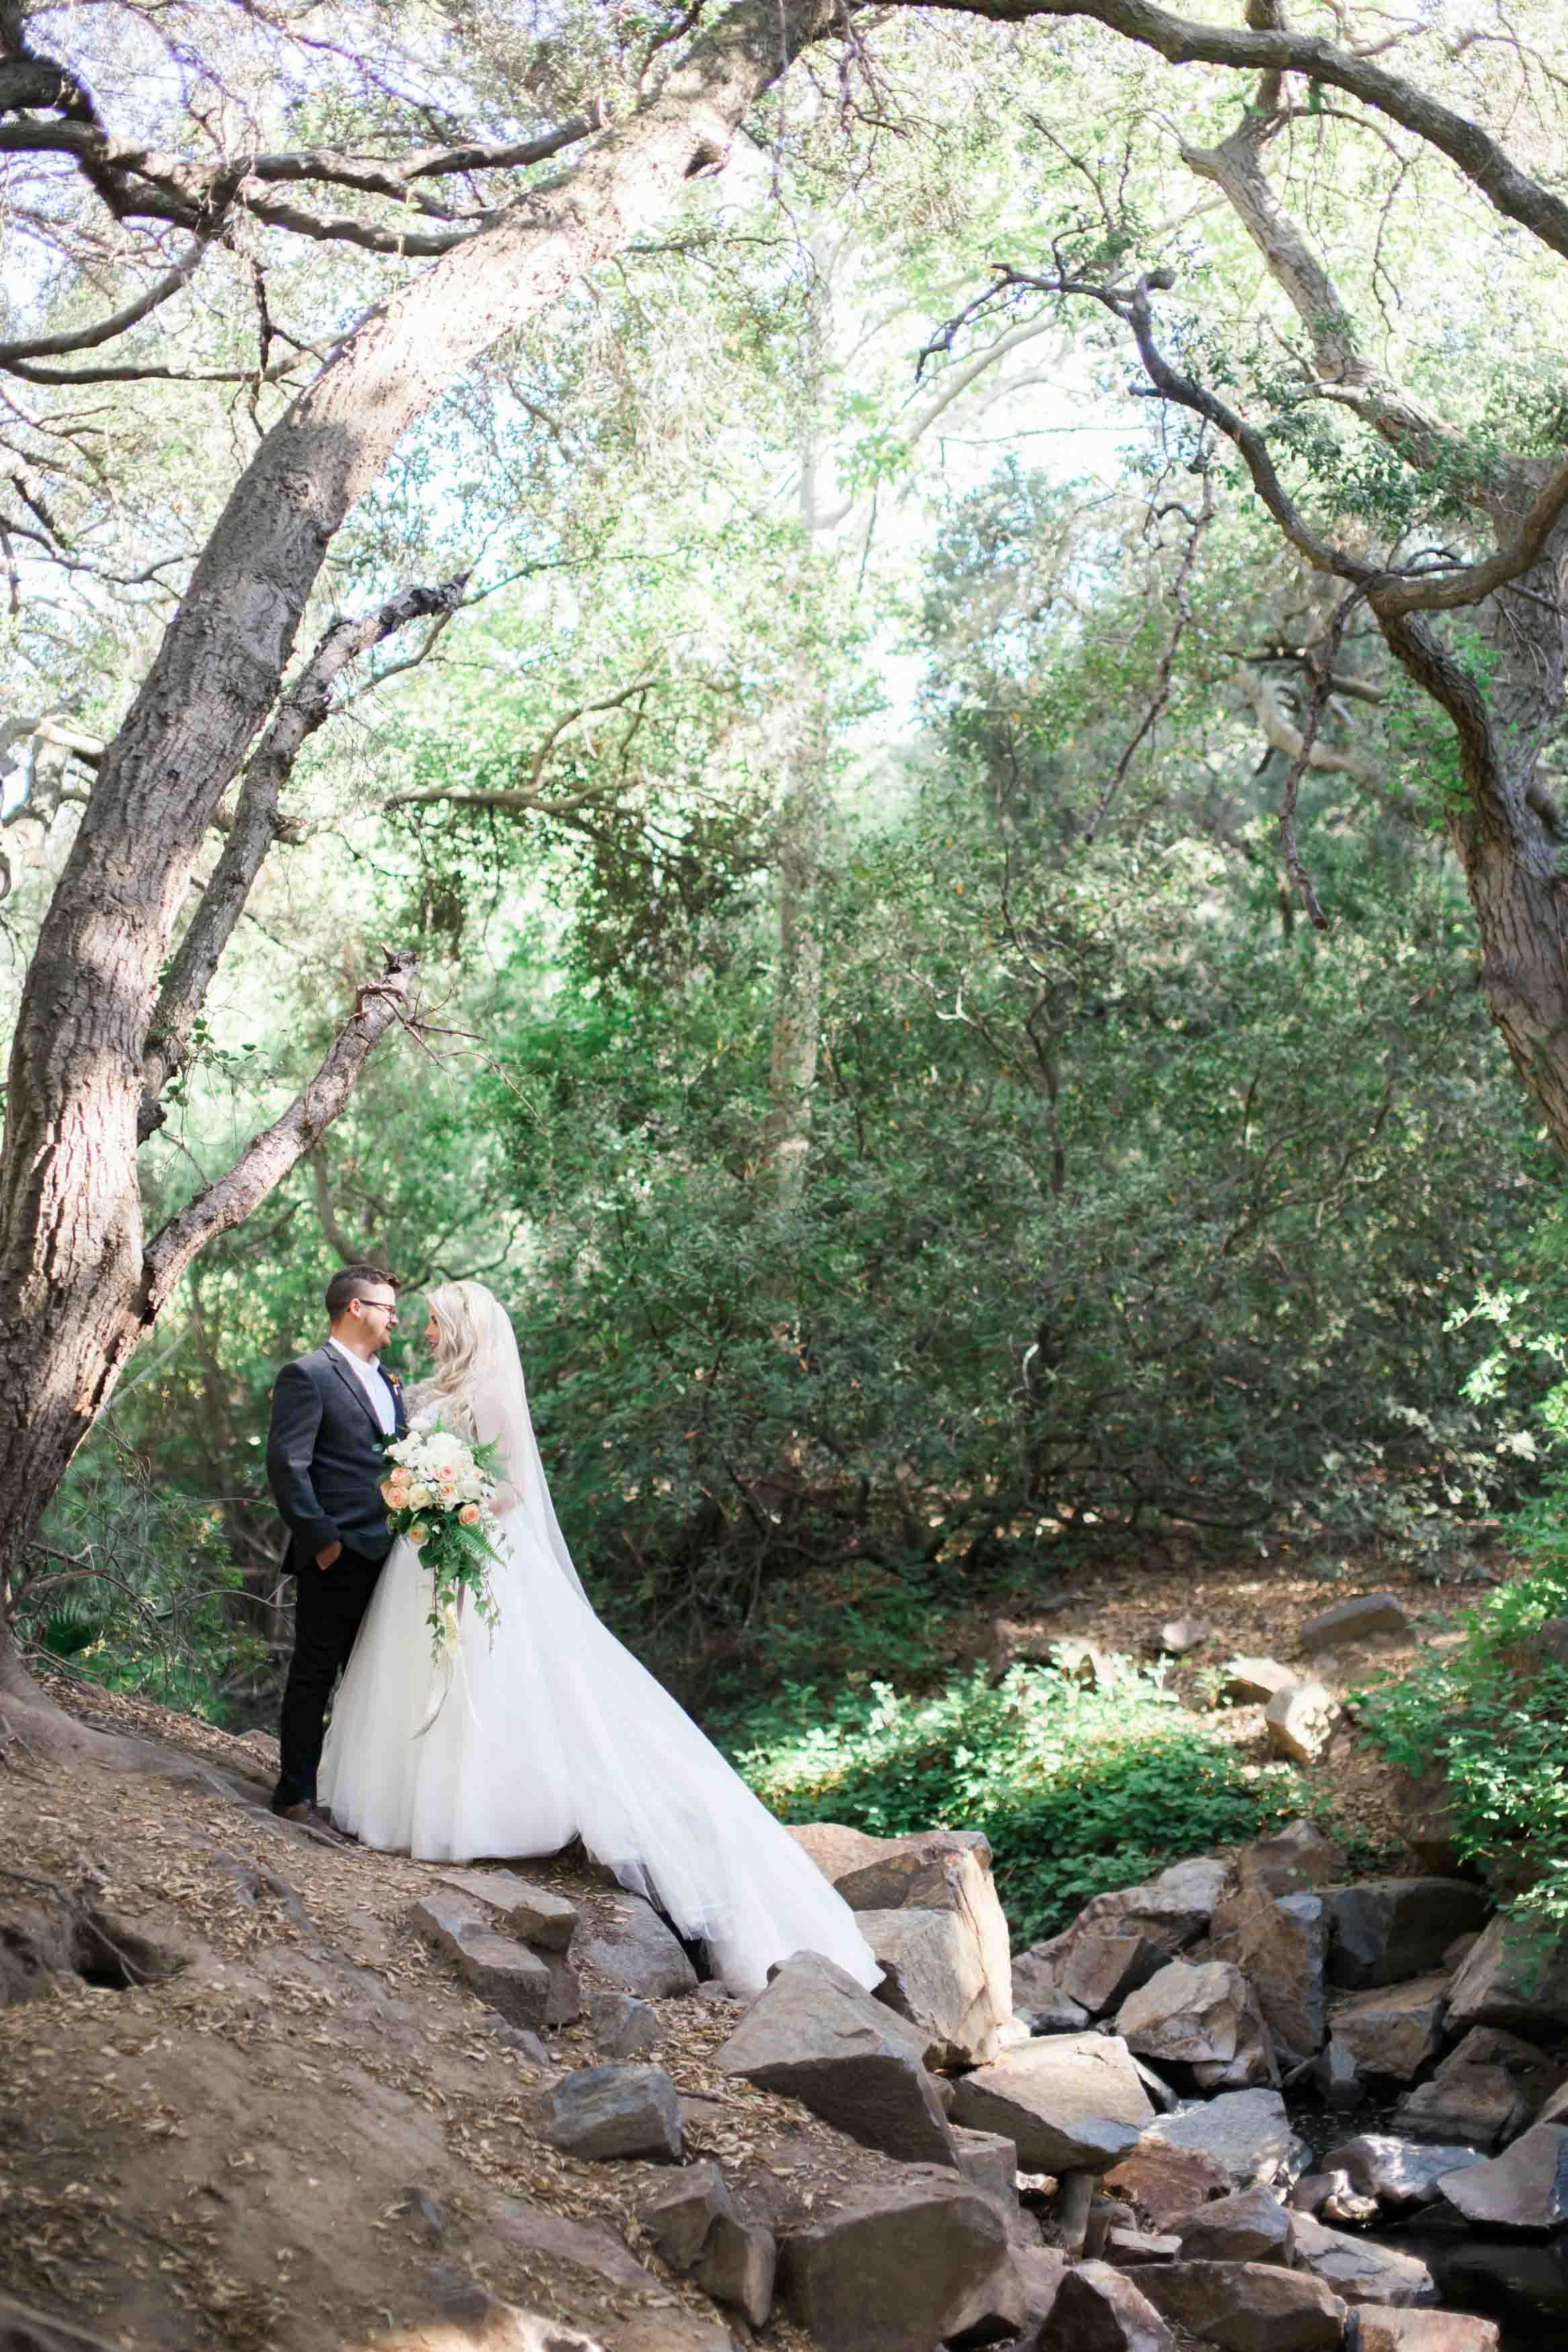 Kiara_and_Corbin_WEDDING_ Brienne_Michelle_Photography_055.JPG